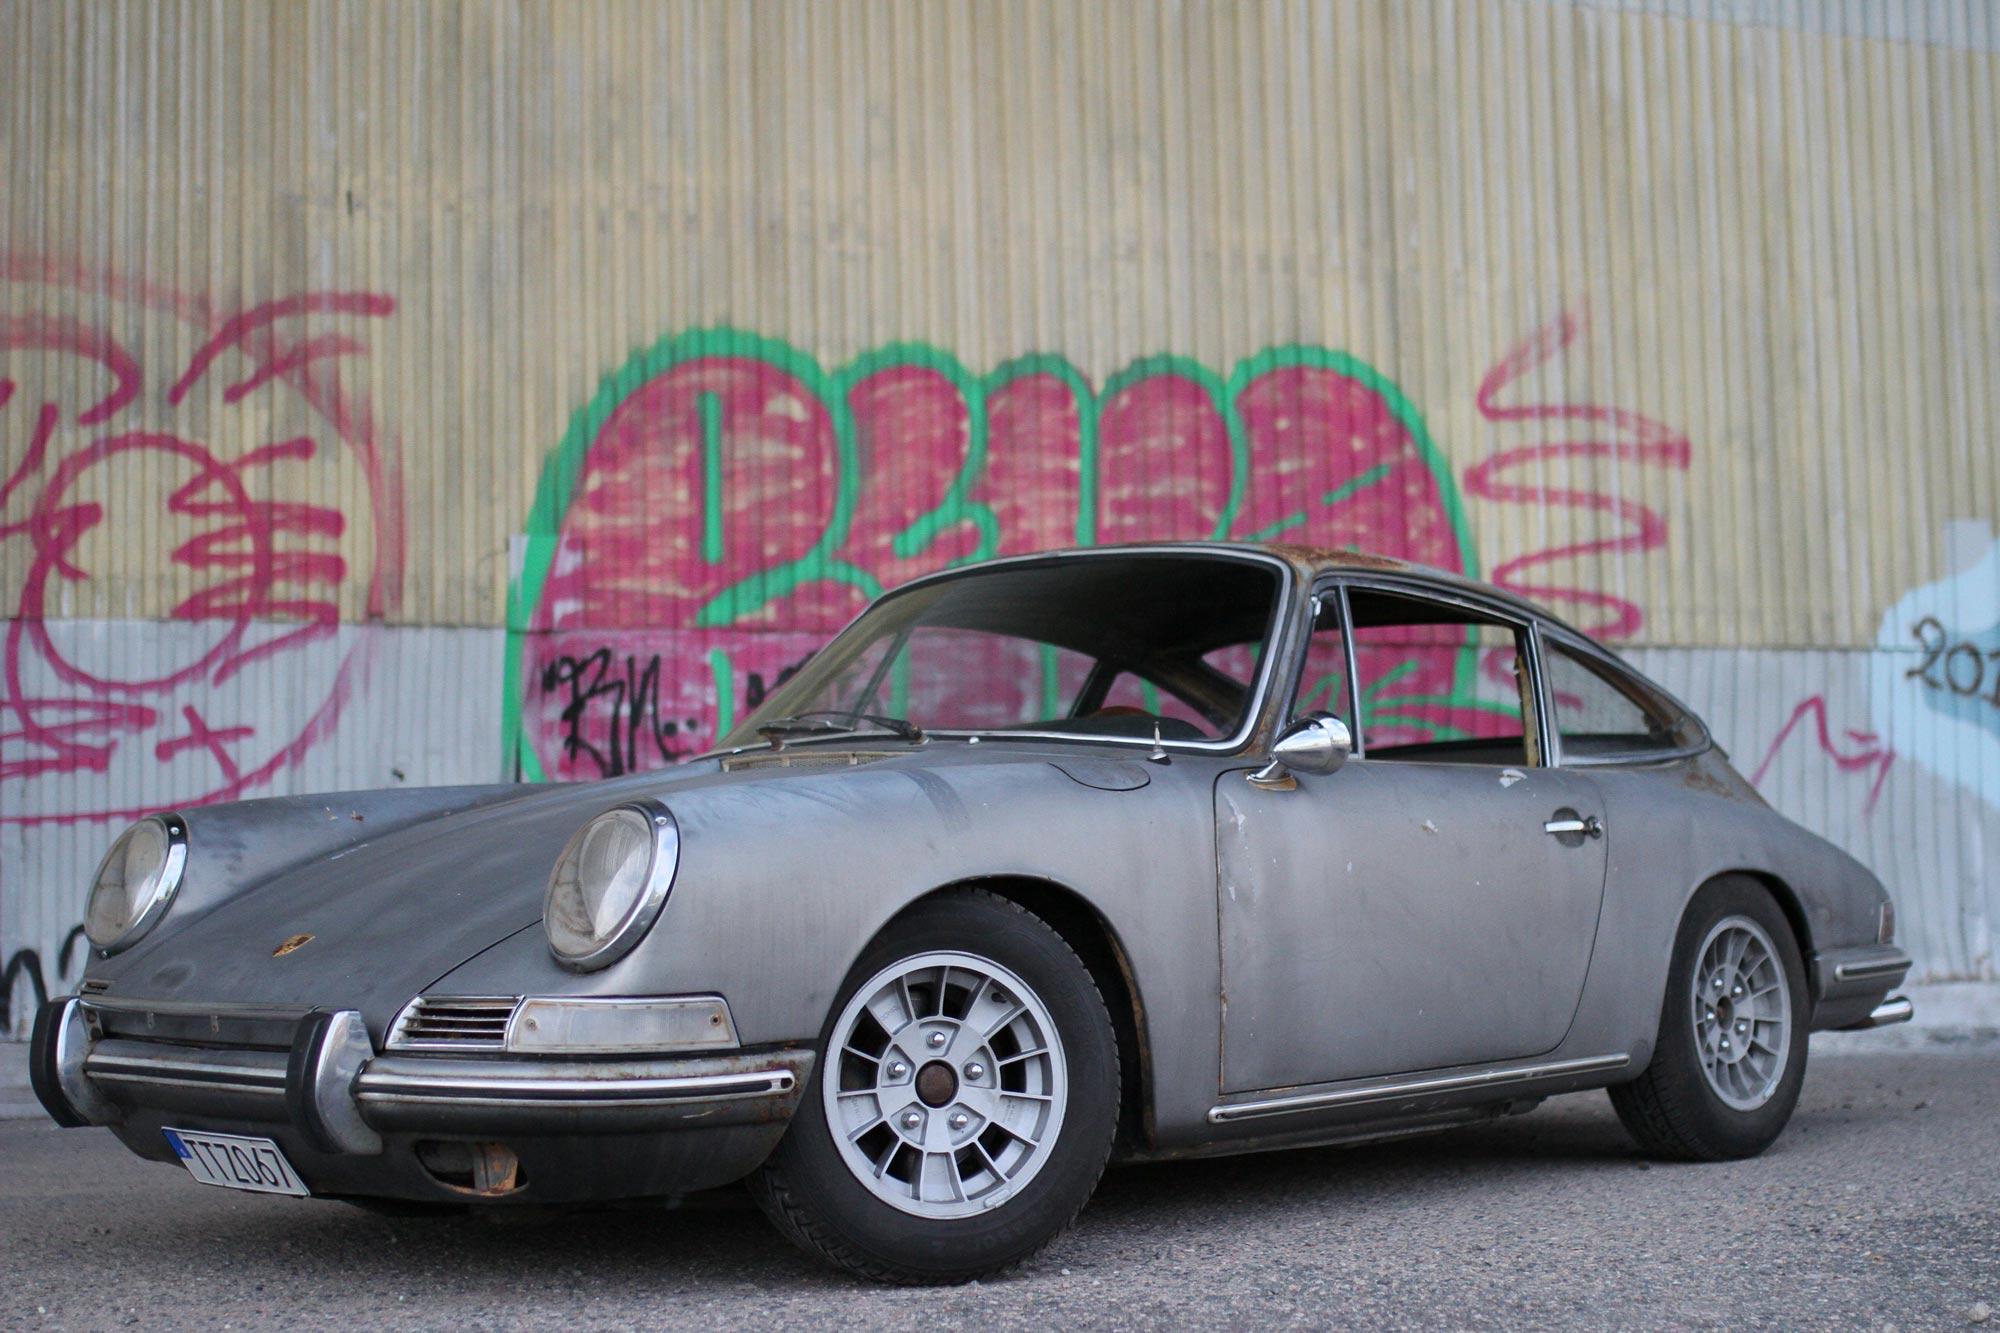 Patina Porsche 912 with its Ronal Kleeblatt rims with a graffiti backdrop